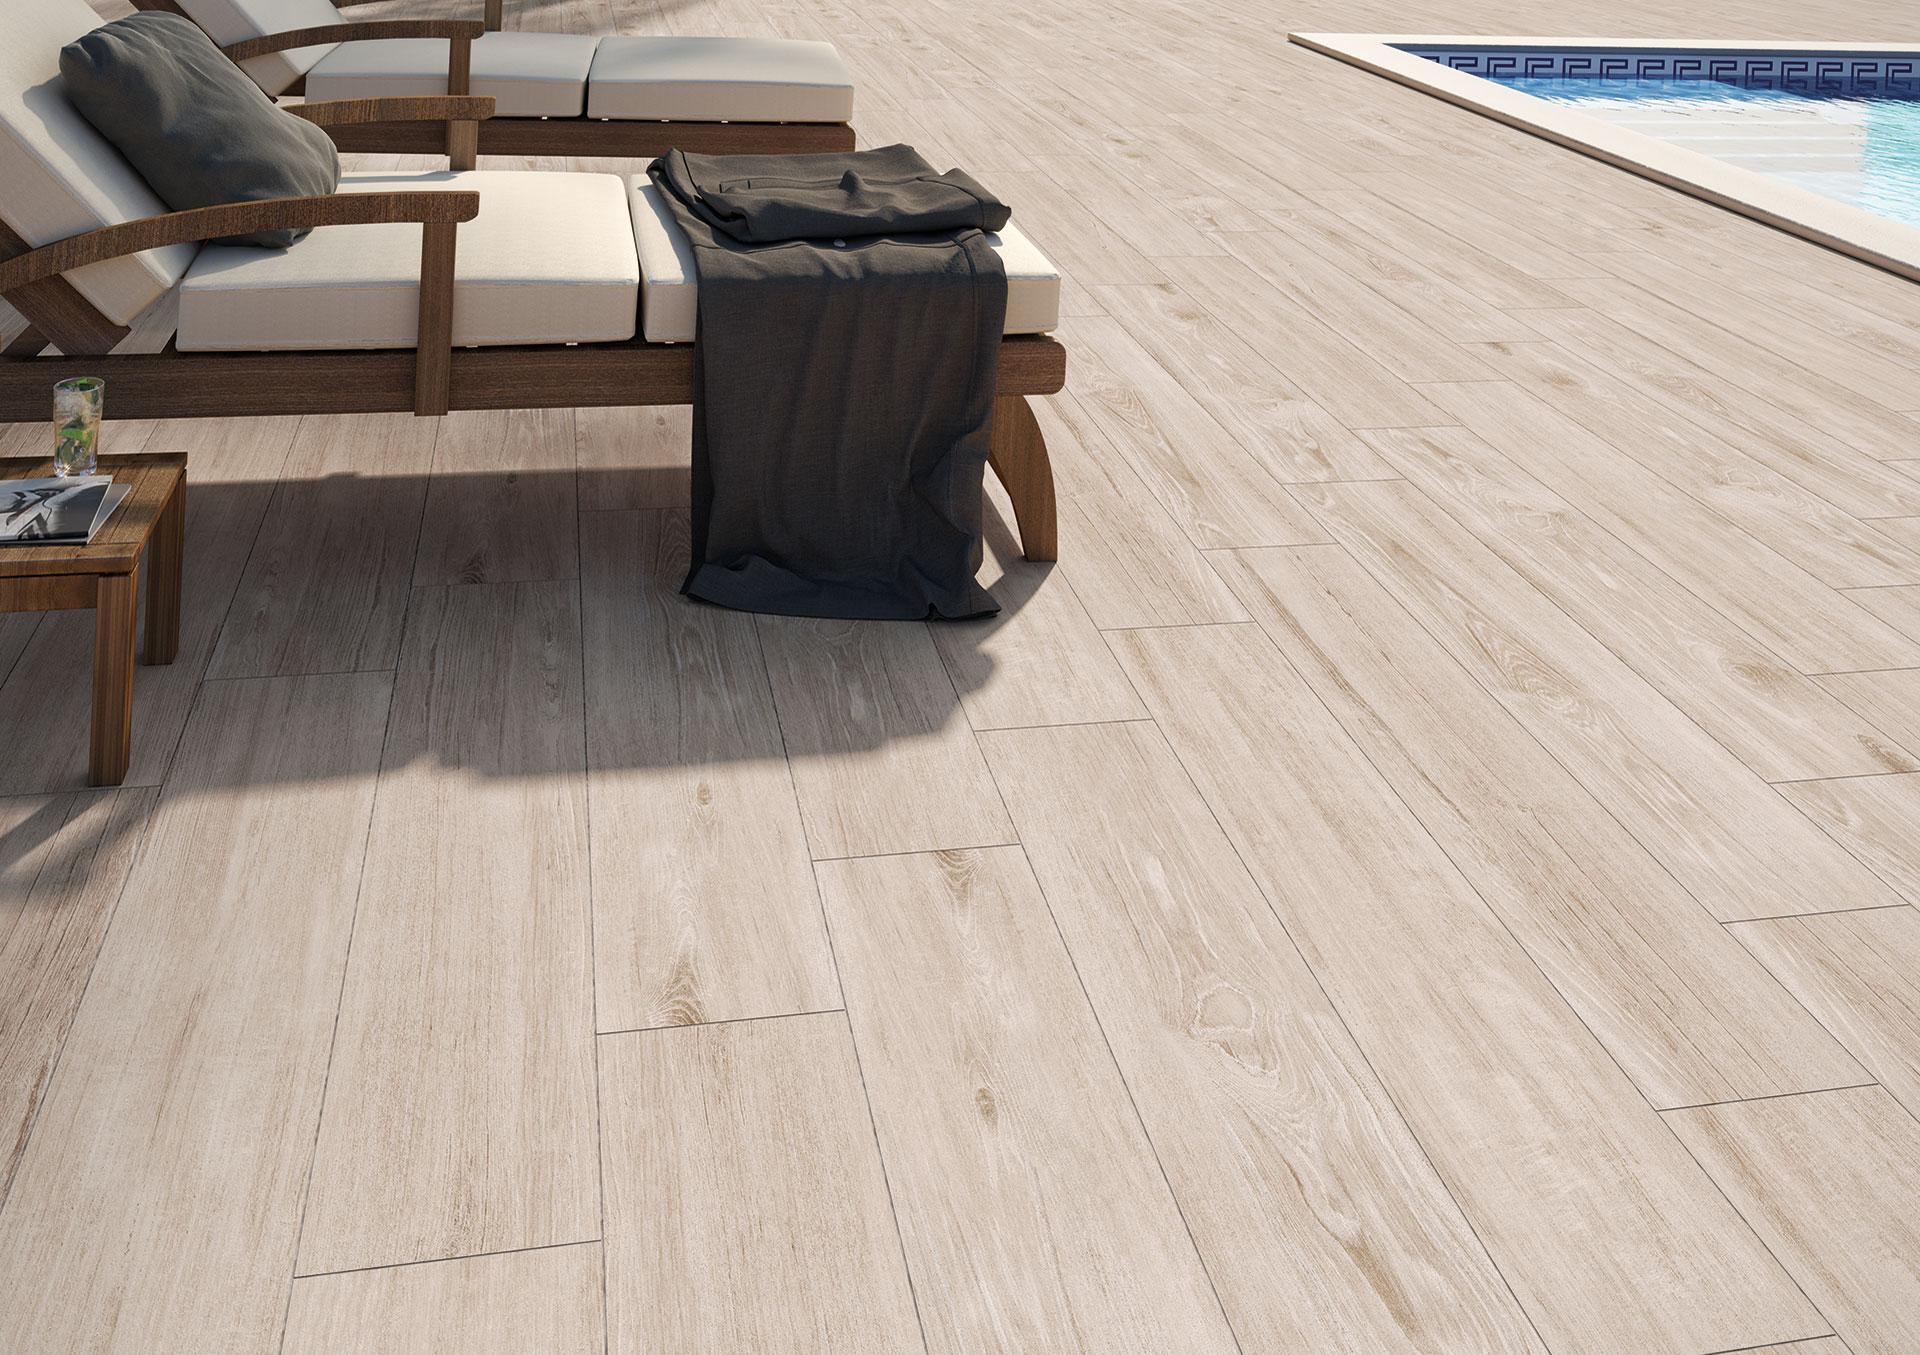 Azulejos-gres-porcelanico-Pavimento-Revestimiento-vilema_imitacion_madera